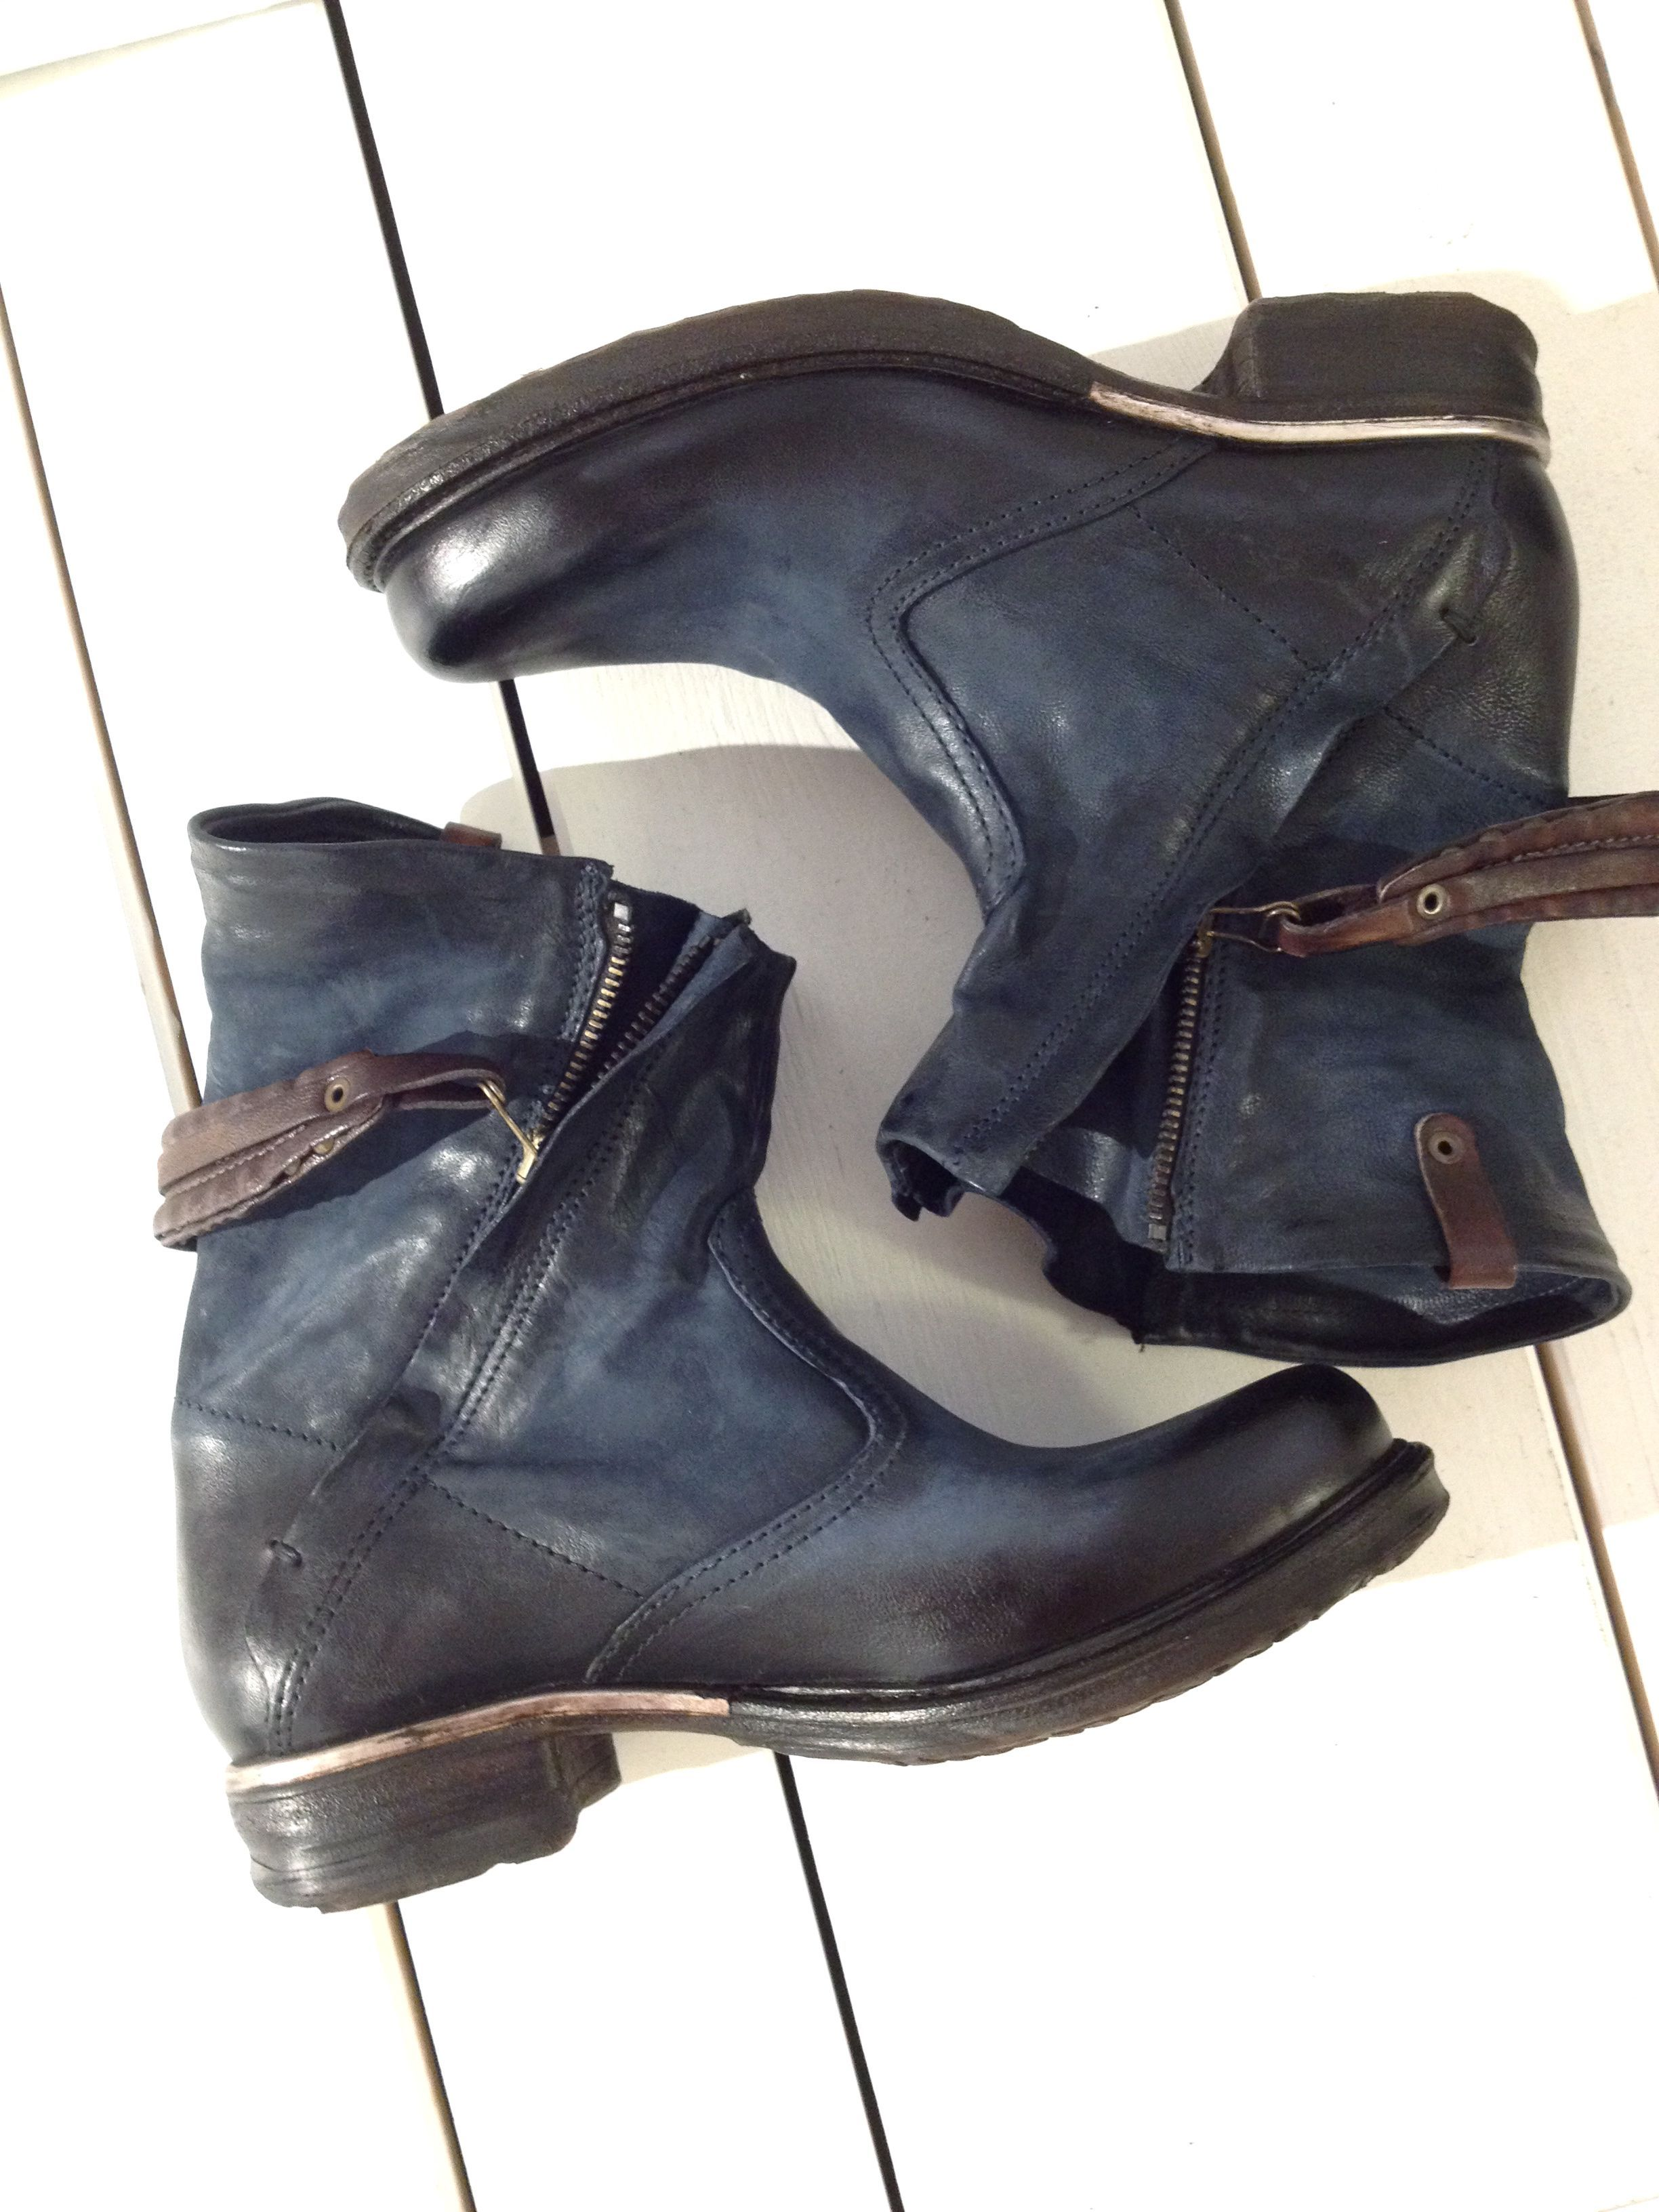 Airstep Boots   F A S H I O N   Skor och Mode